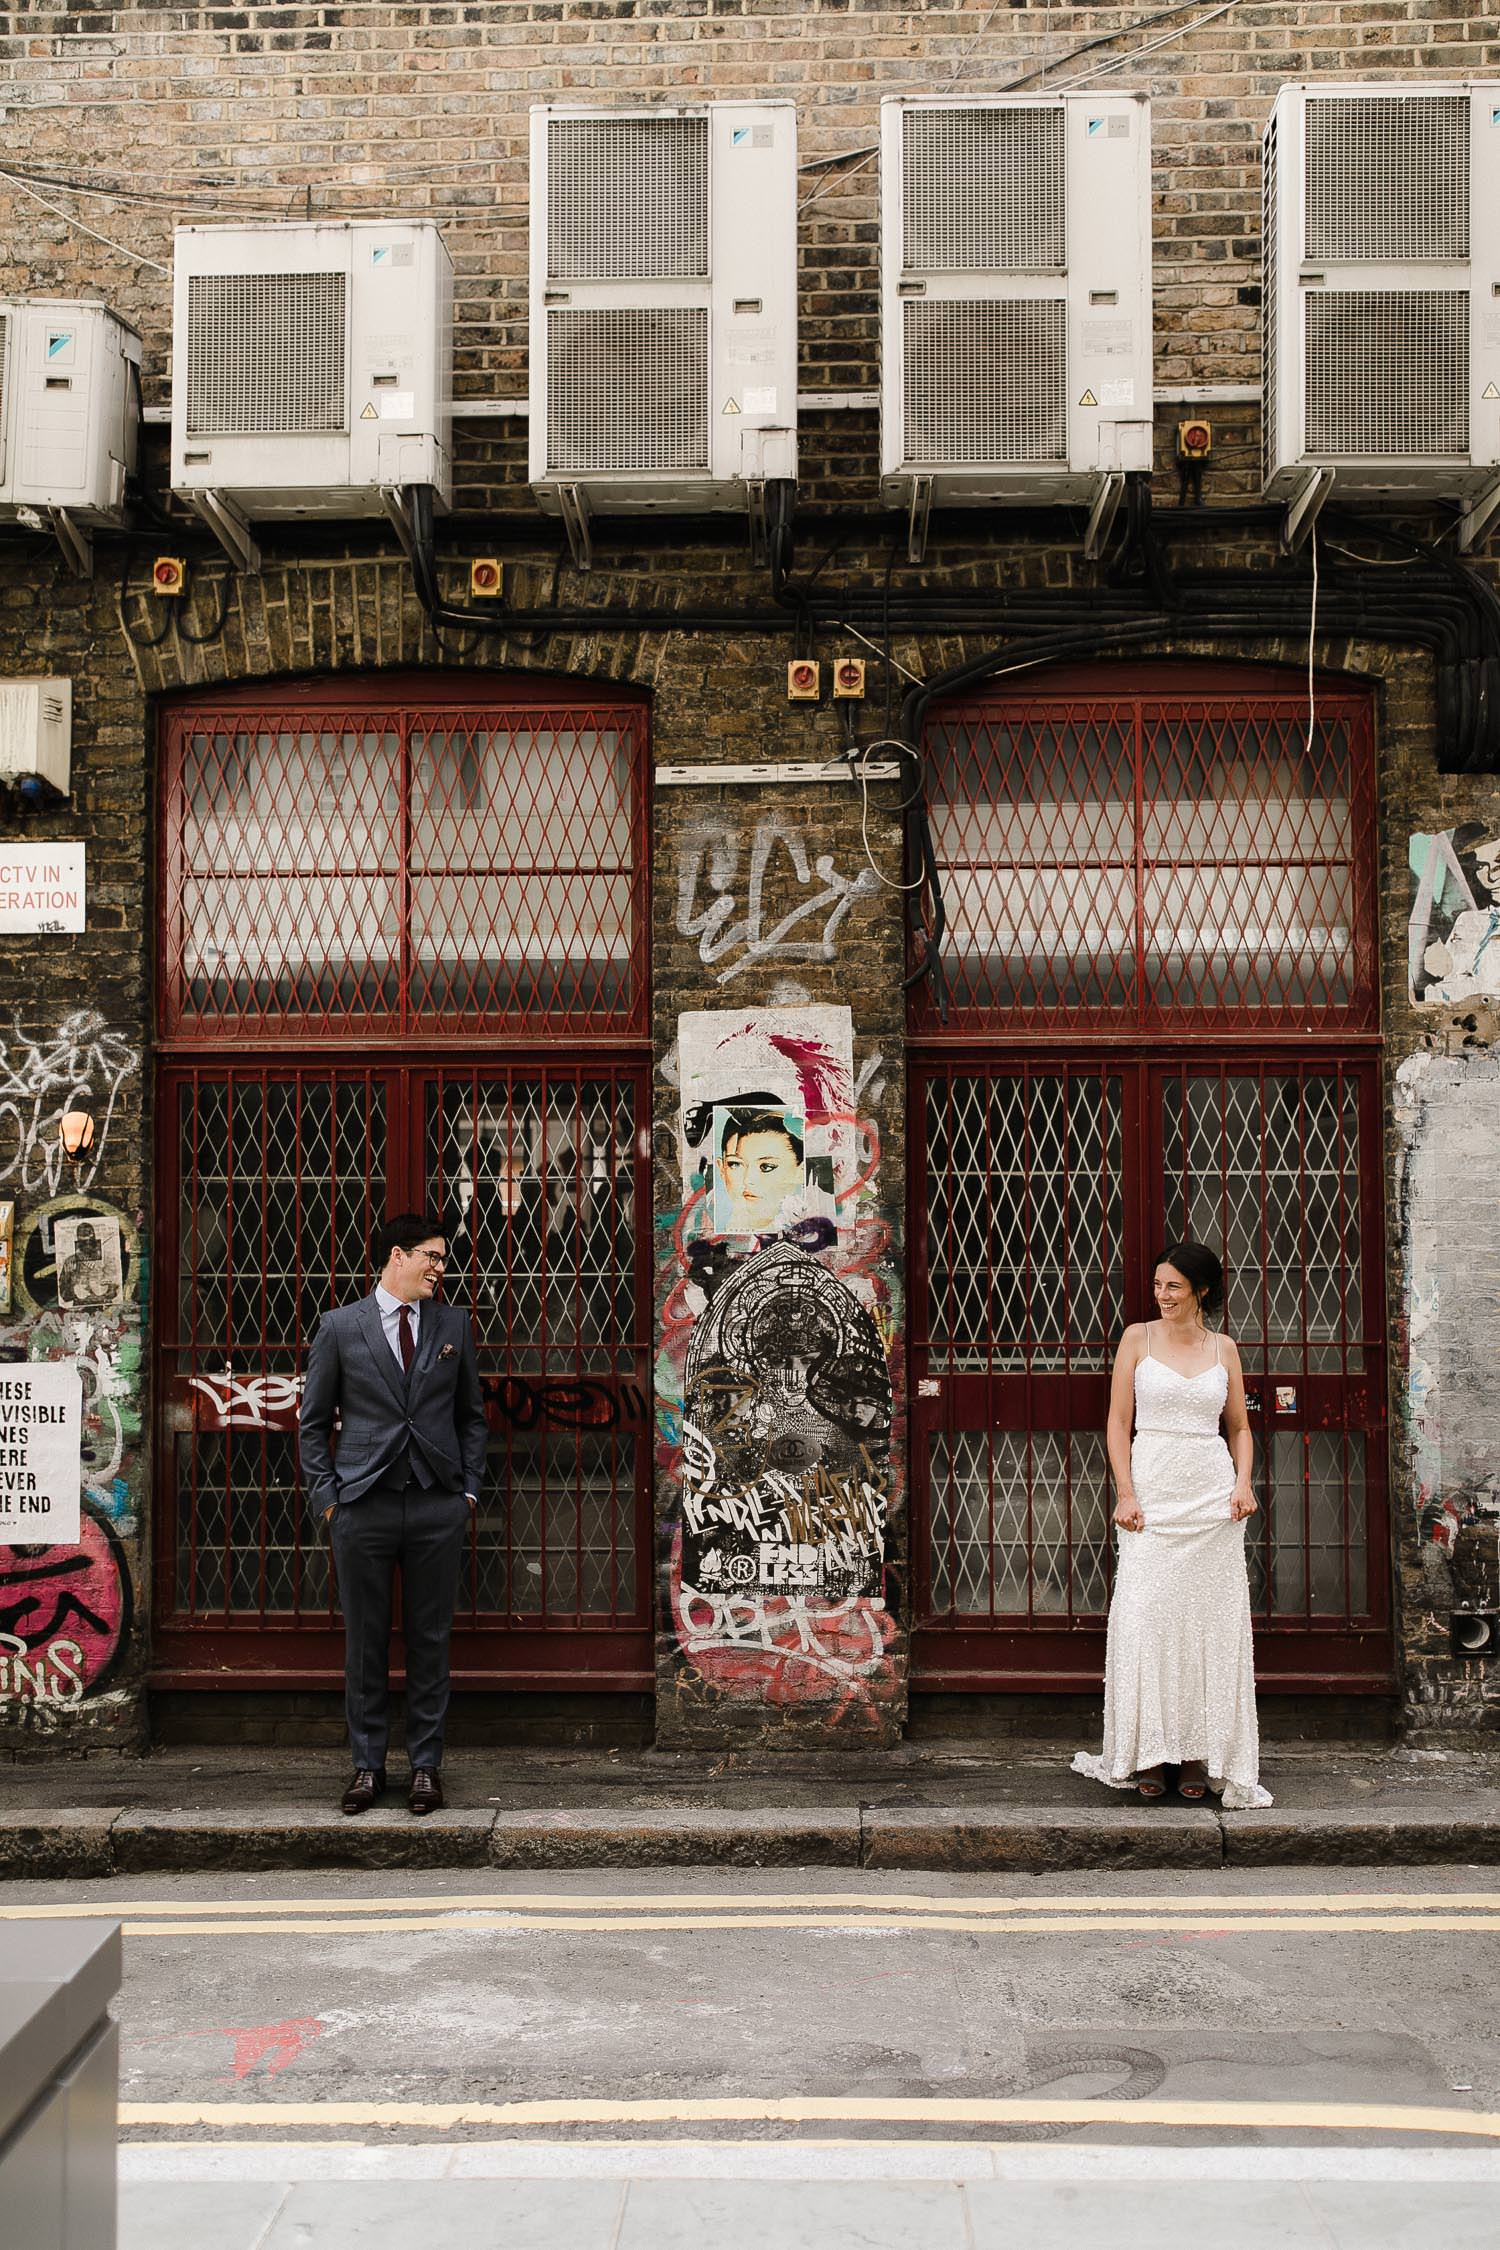 Islington_Town_Hall_Swan_Globe_Theatre_wedding-26.jpg